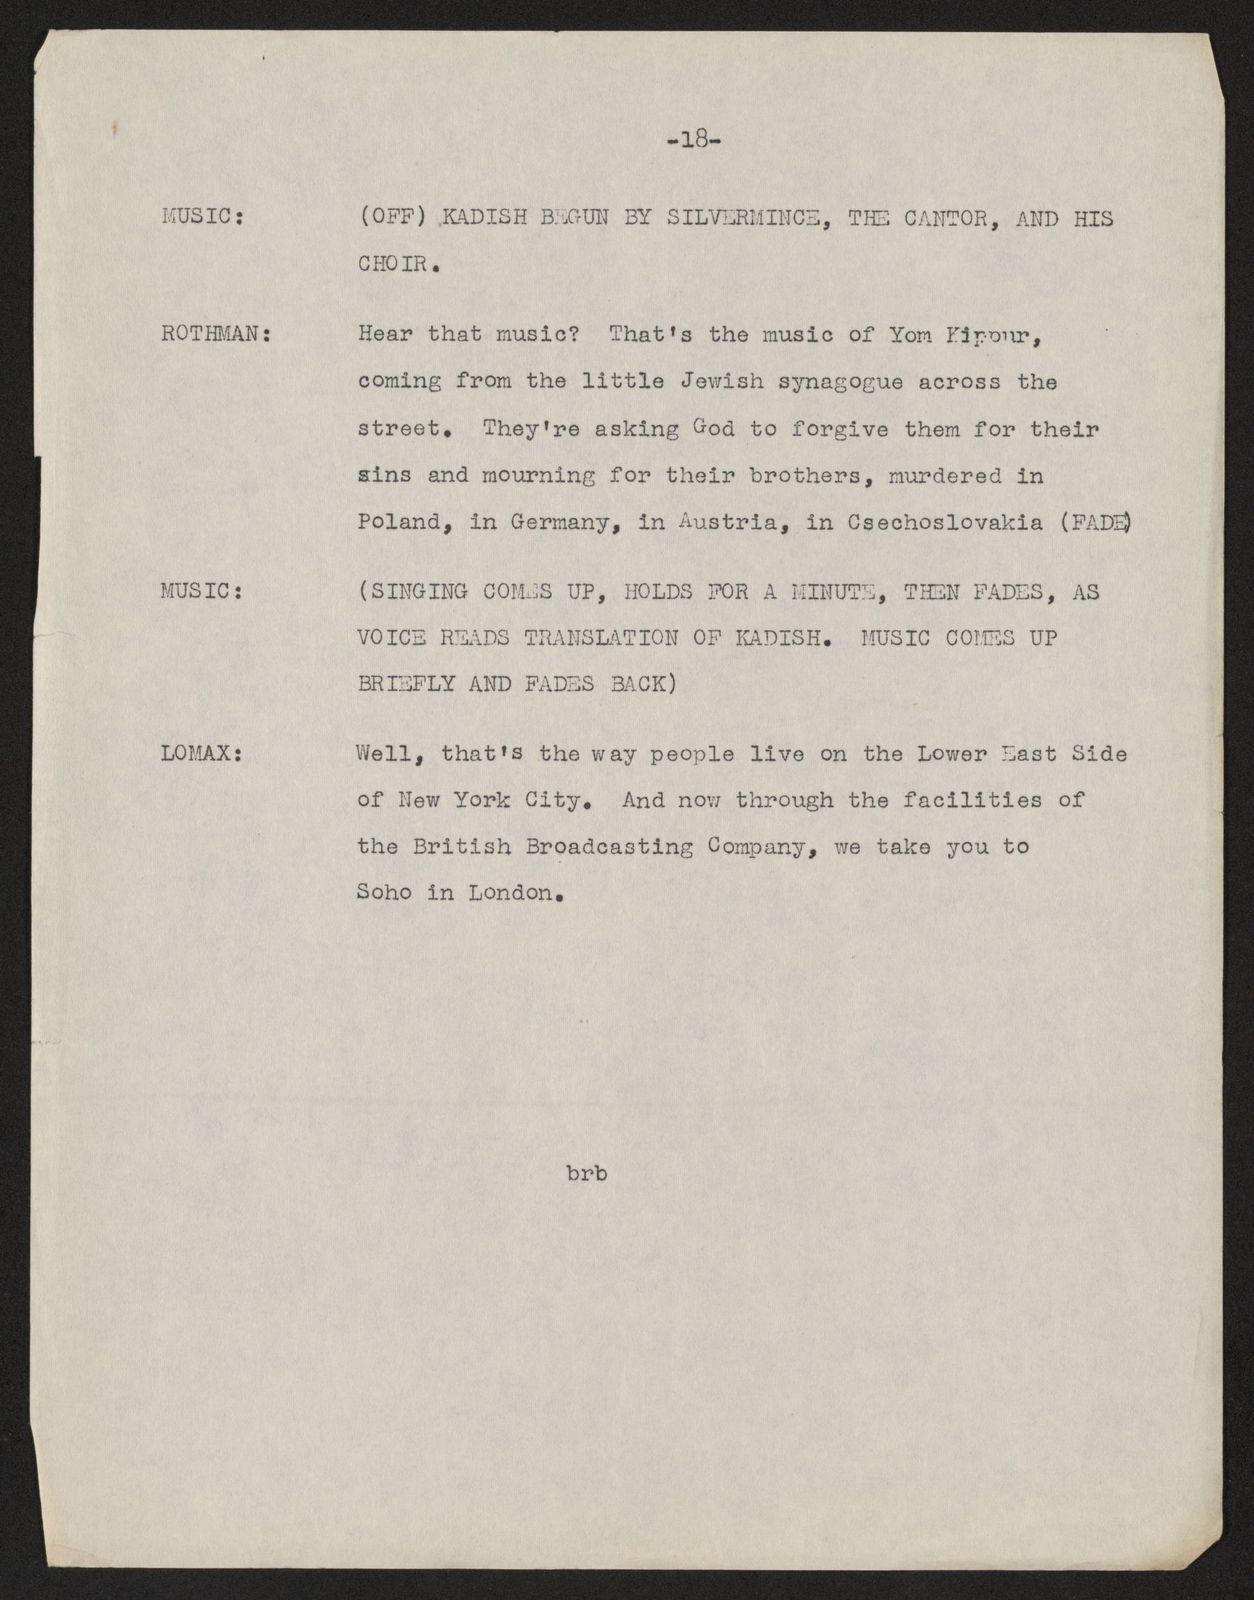 Alan Lomax Collection, Manuscripts, Radio network unknown